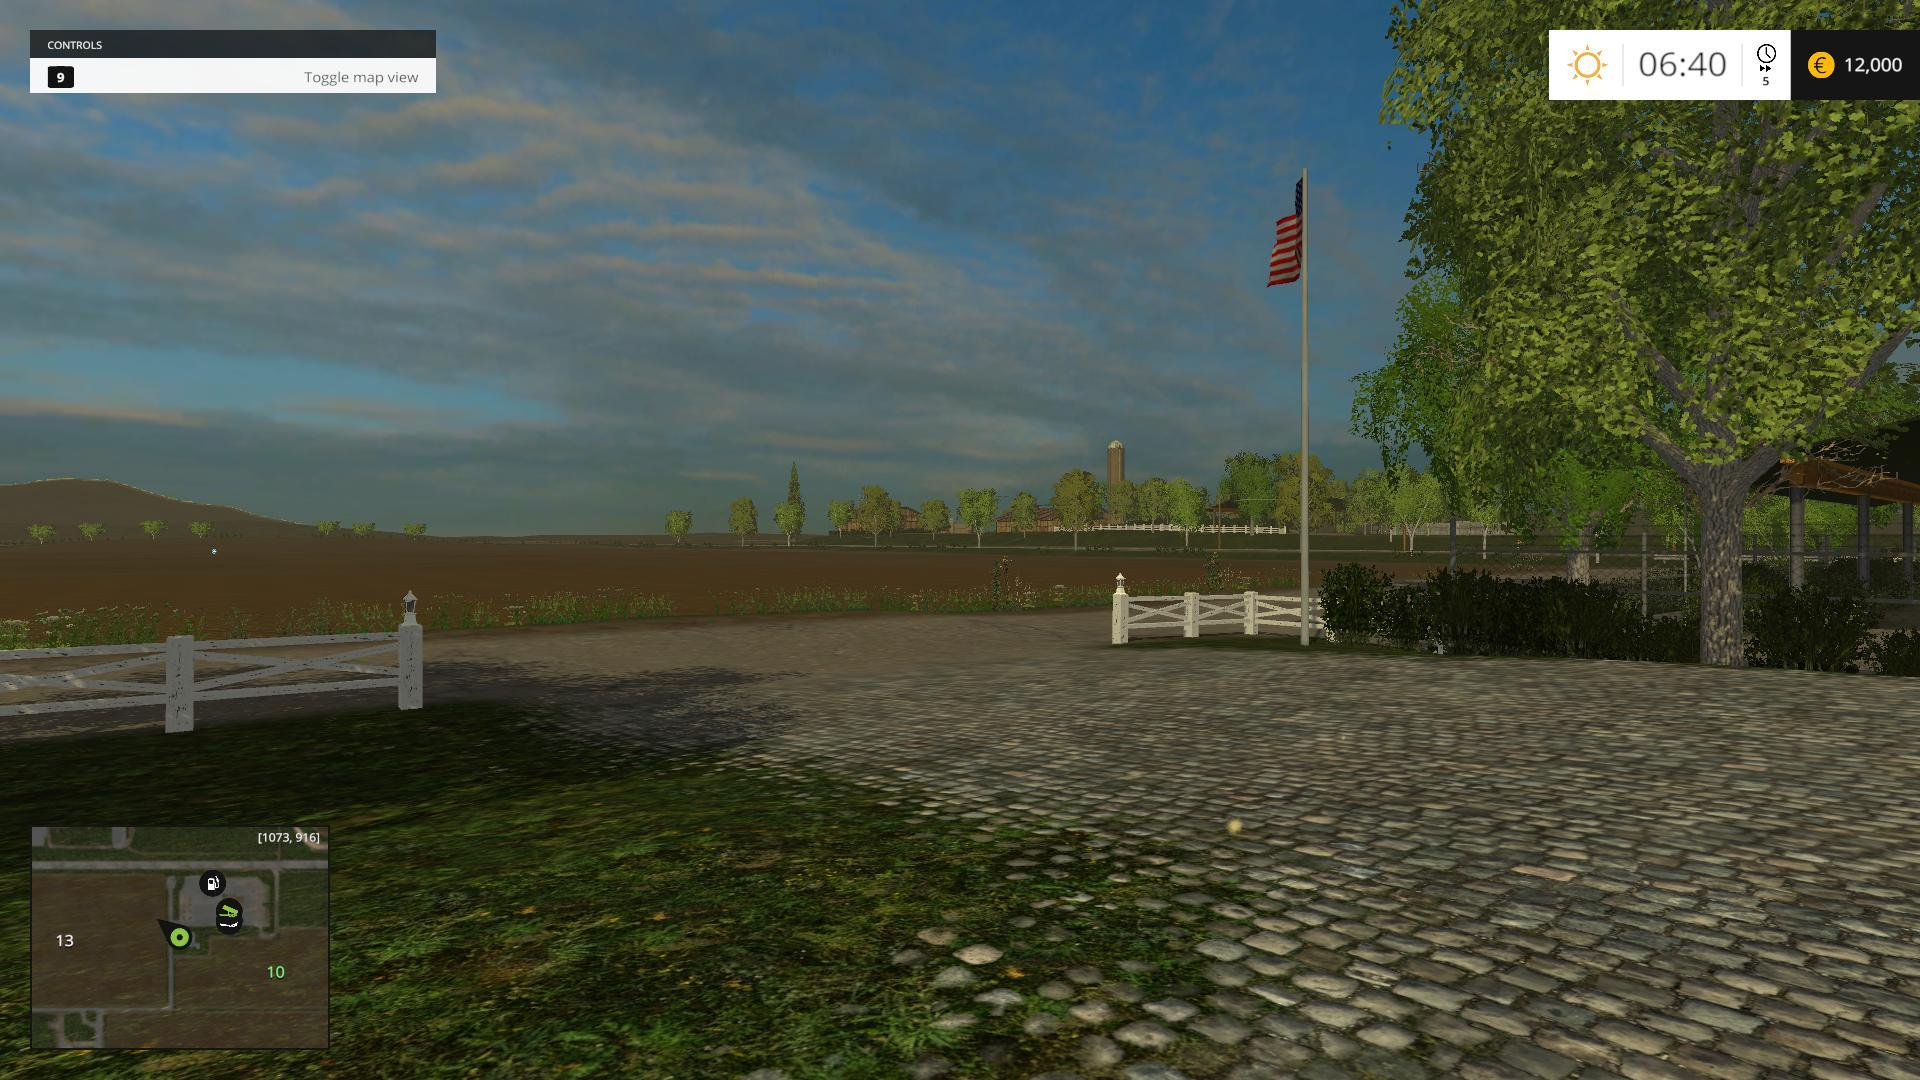 VALLEY EAST USA MAP Farming simulator 2019 2017 2015 Mod